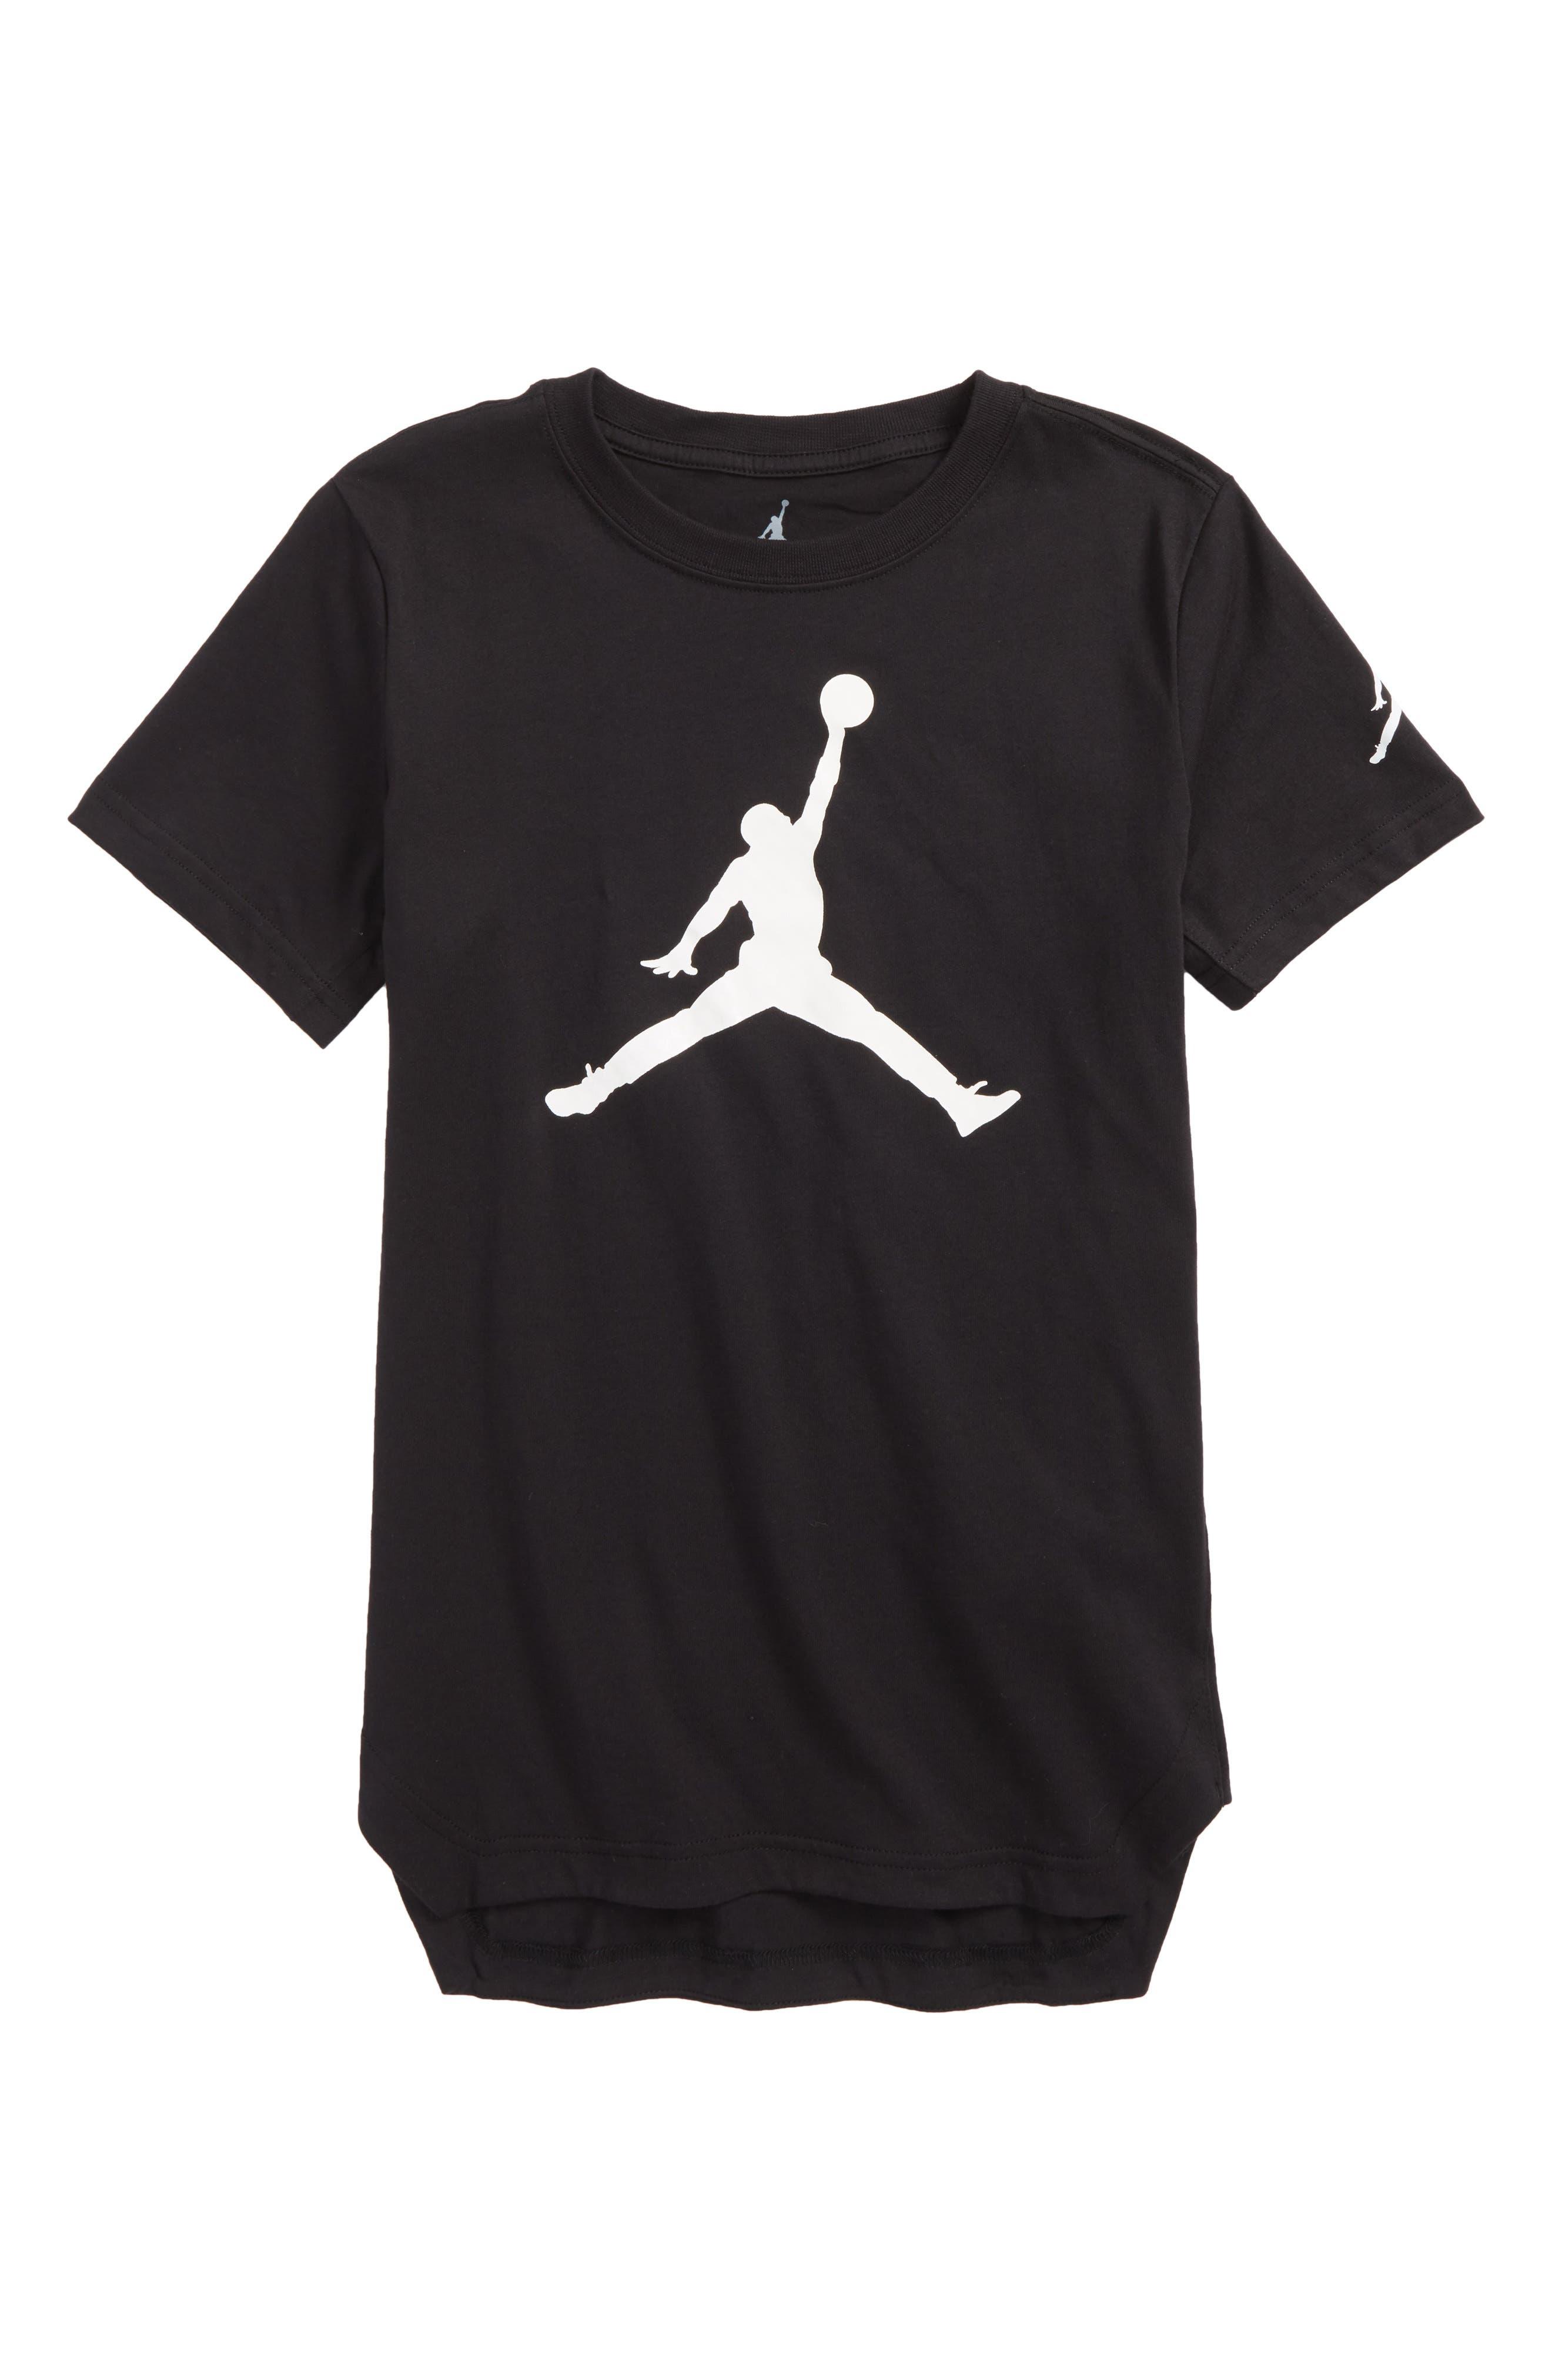 Alternate Image 1 Selected - Jordan Jumpman Brand T-Shirt (Big Boys)